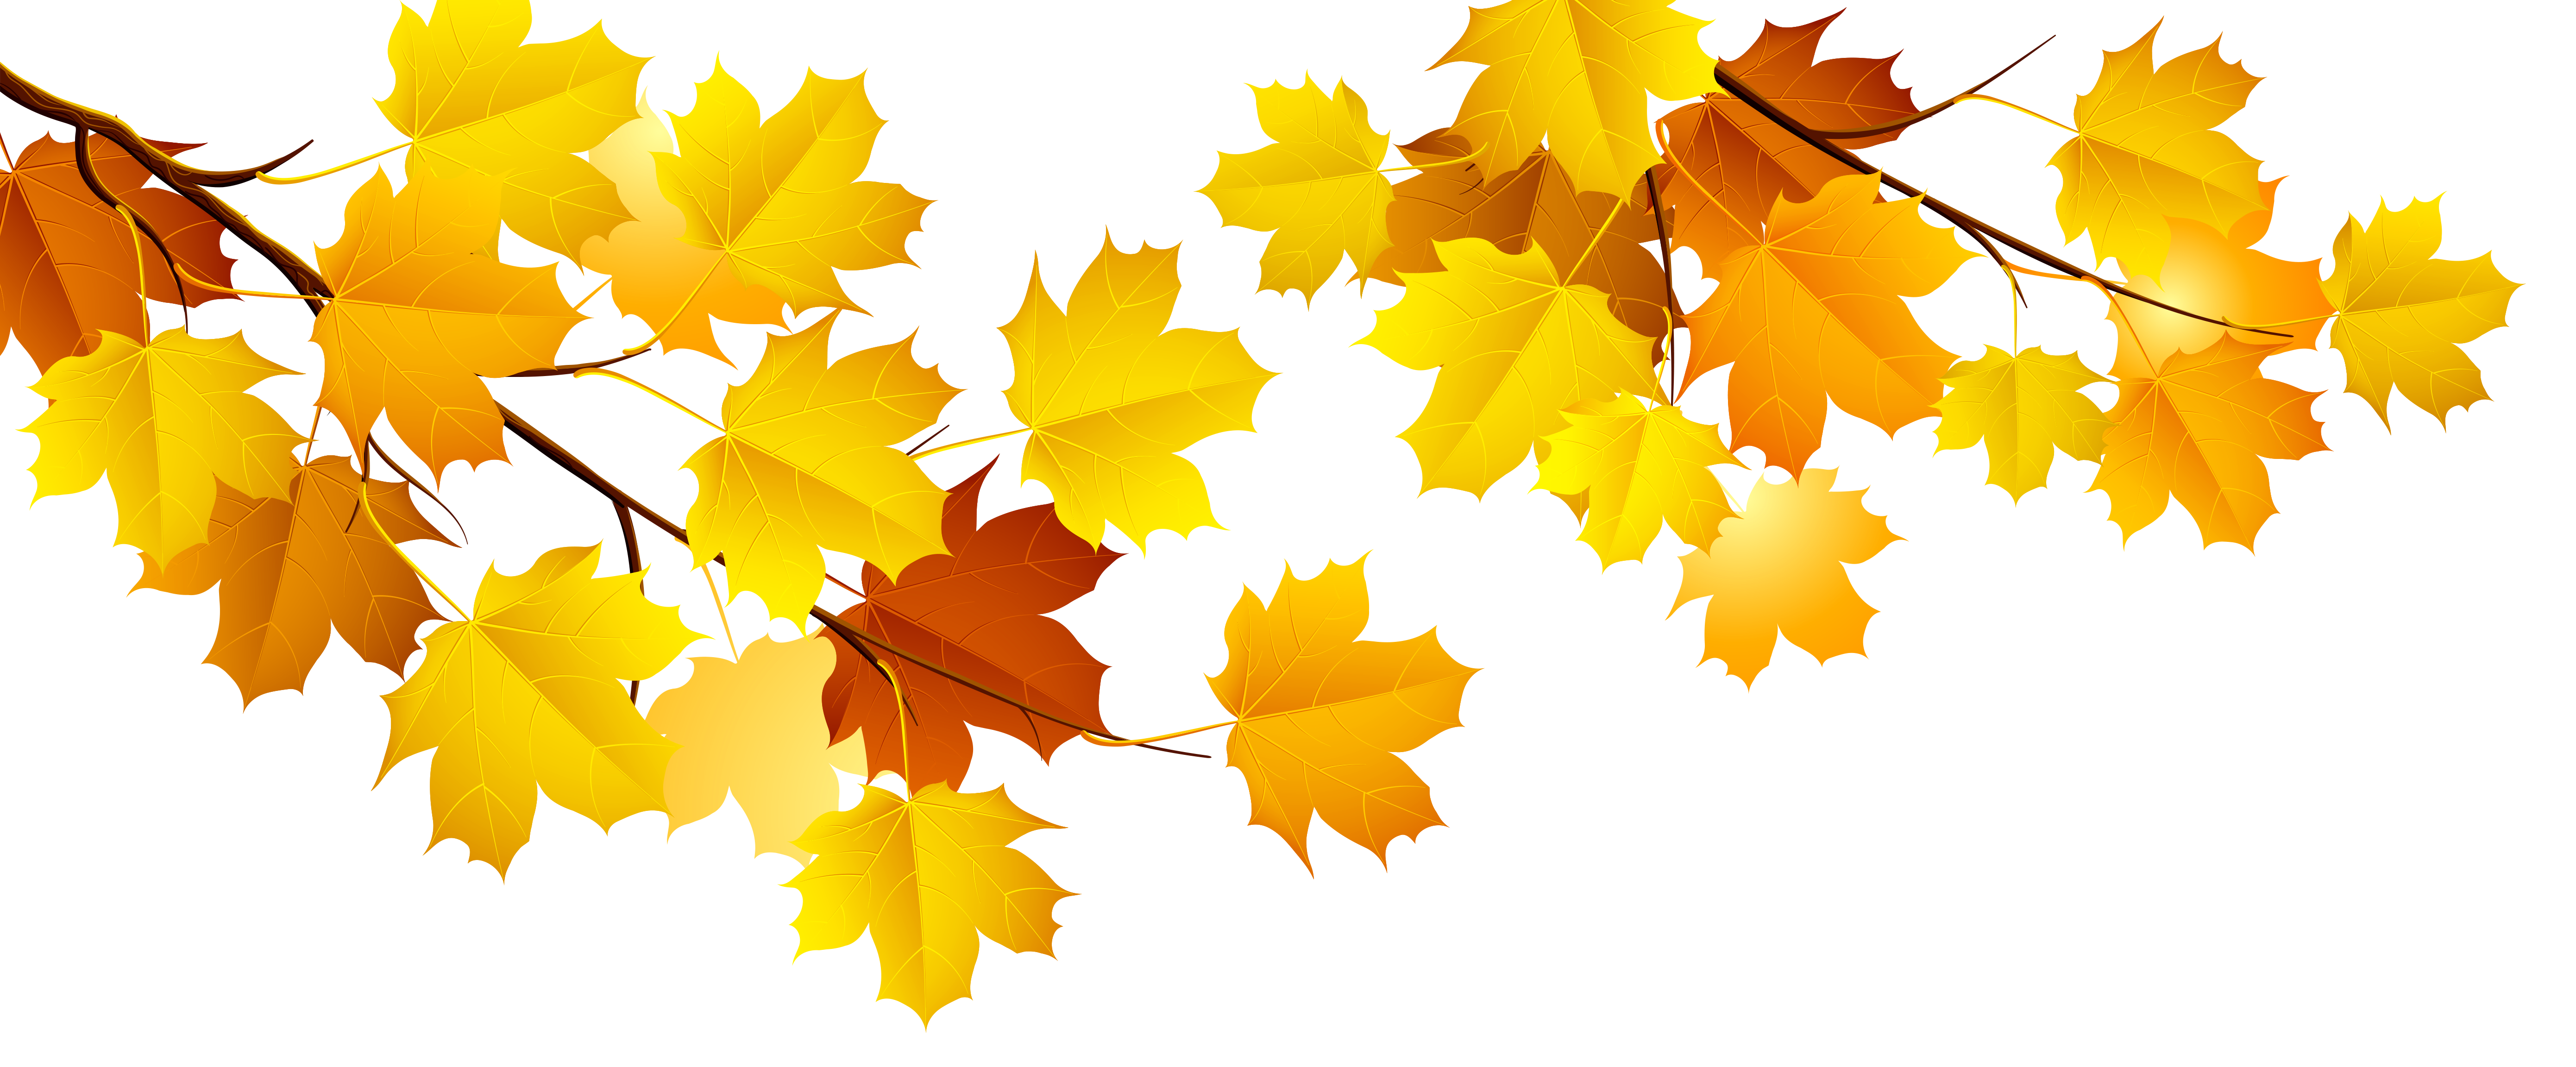 Download Autumn Png Image HQ PNG Image | FreePNGImg